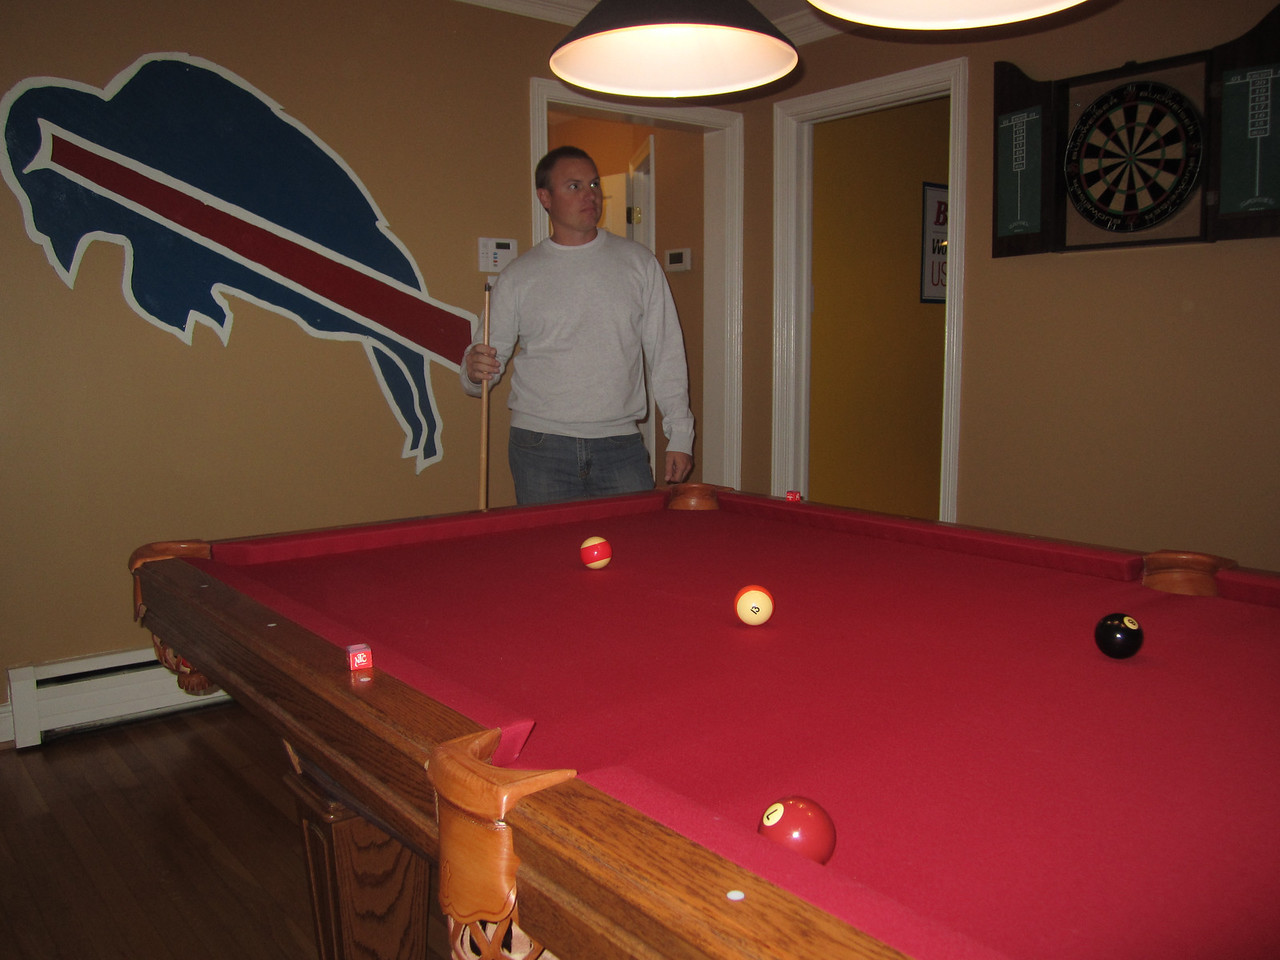 JG at the pool table